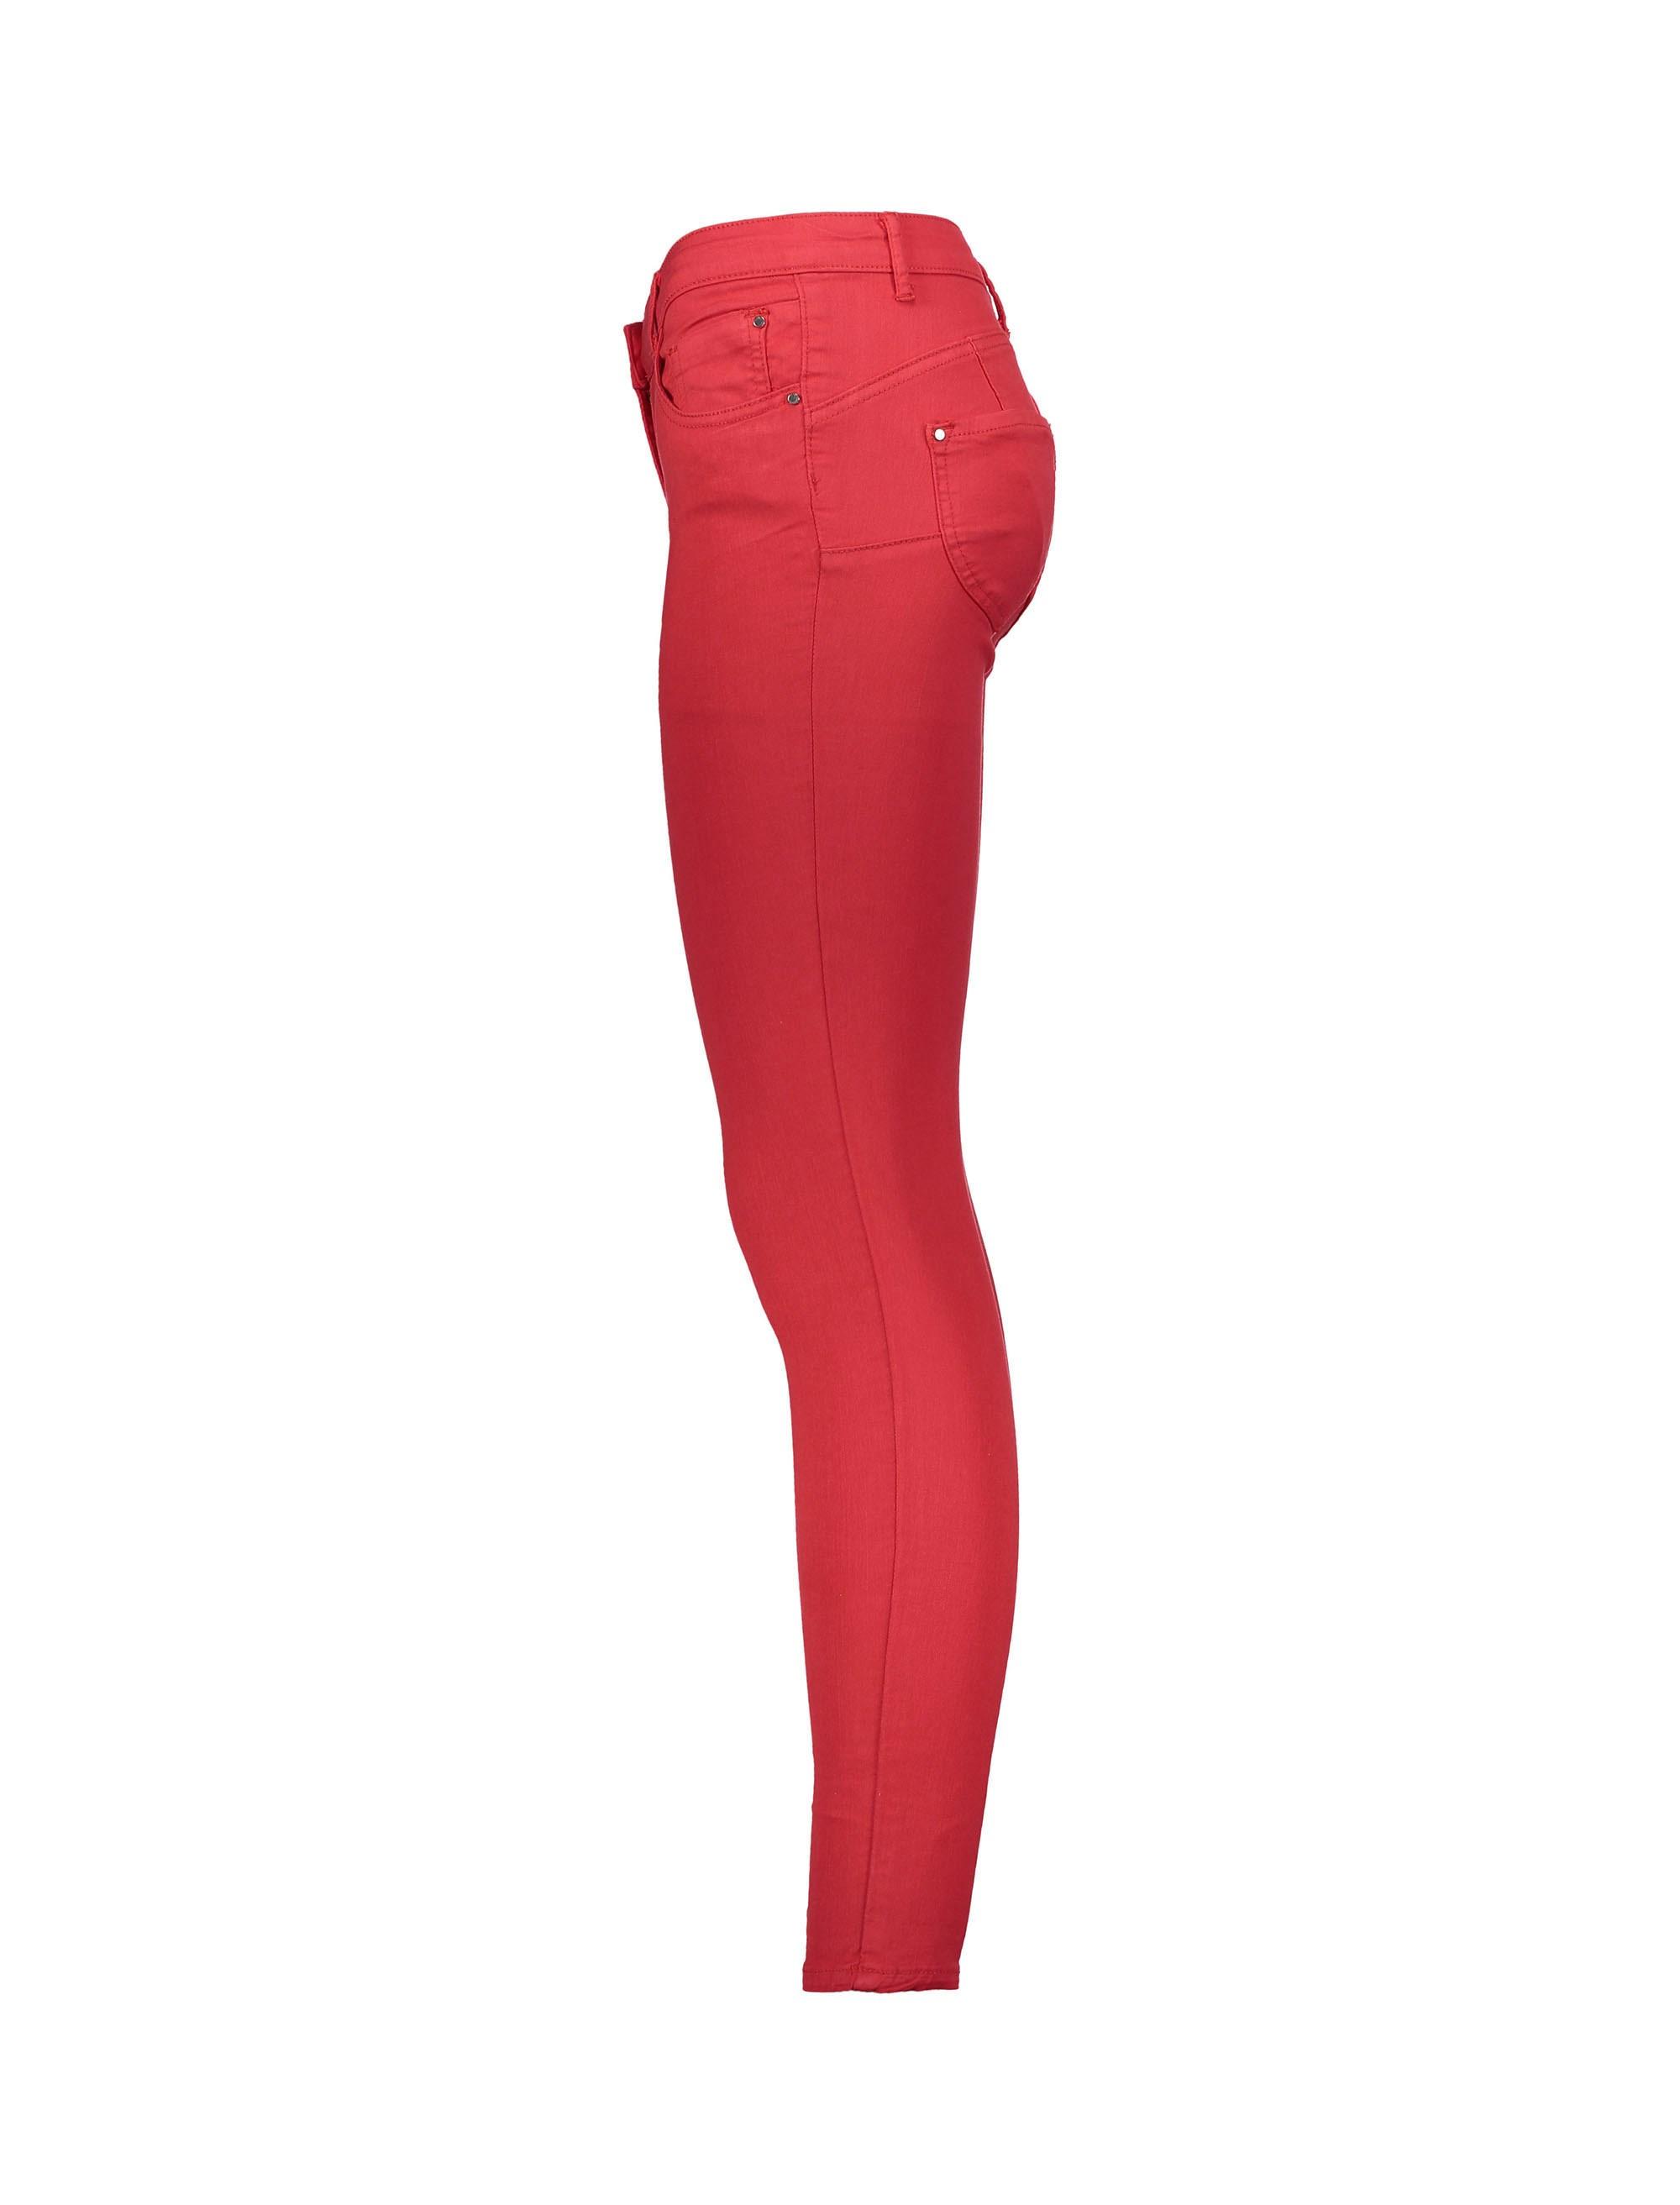 شلوار جین جذب زنانه - قرمز - 4